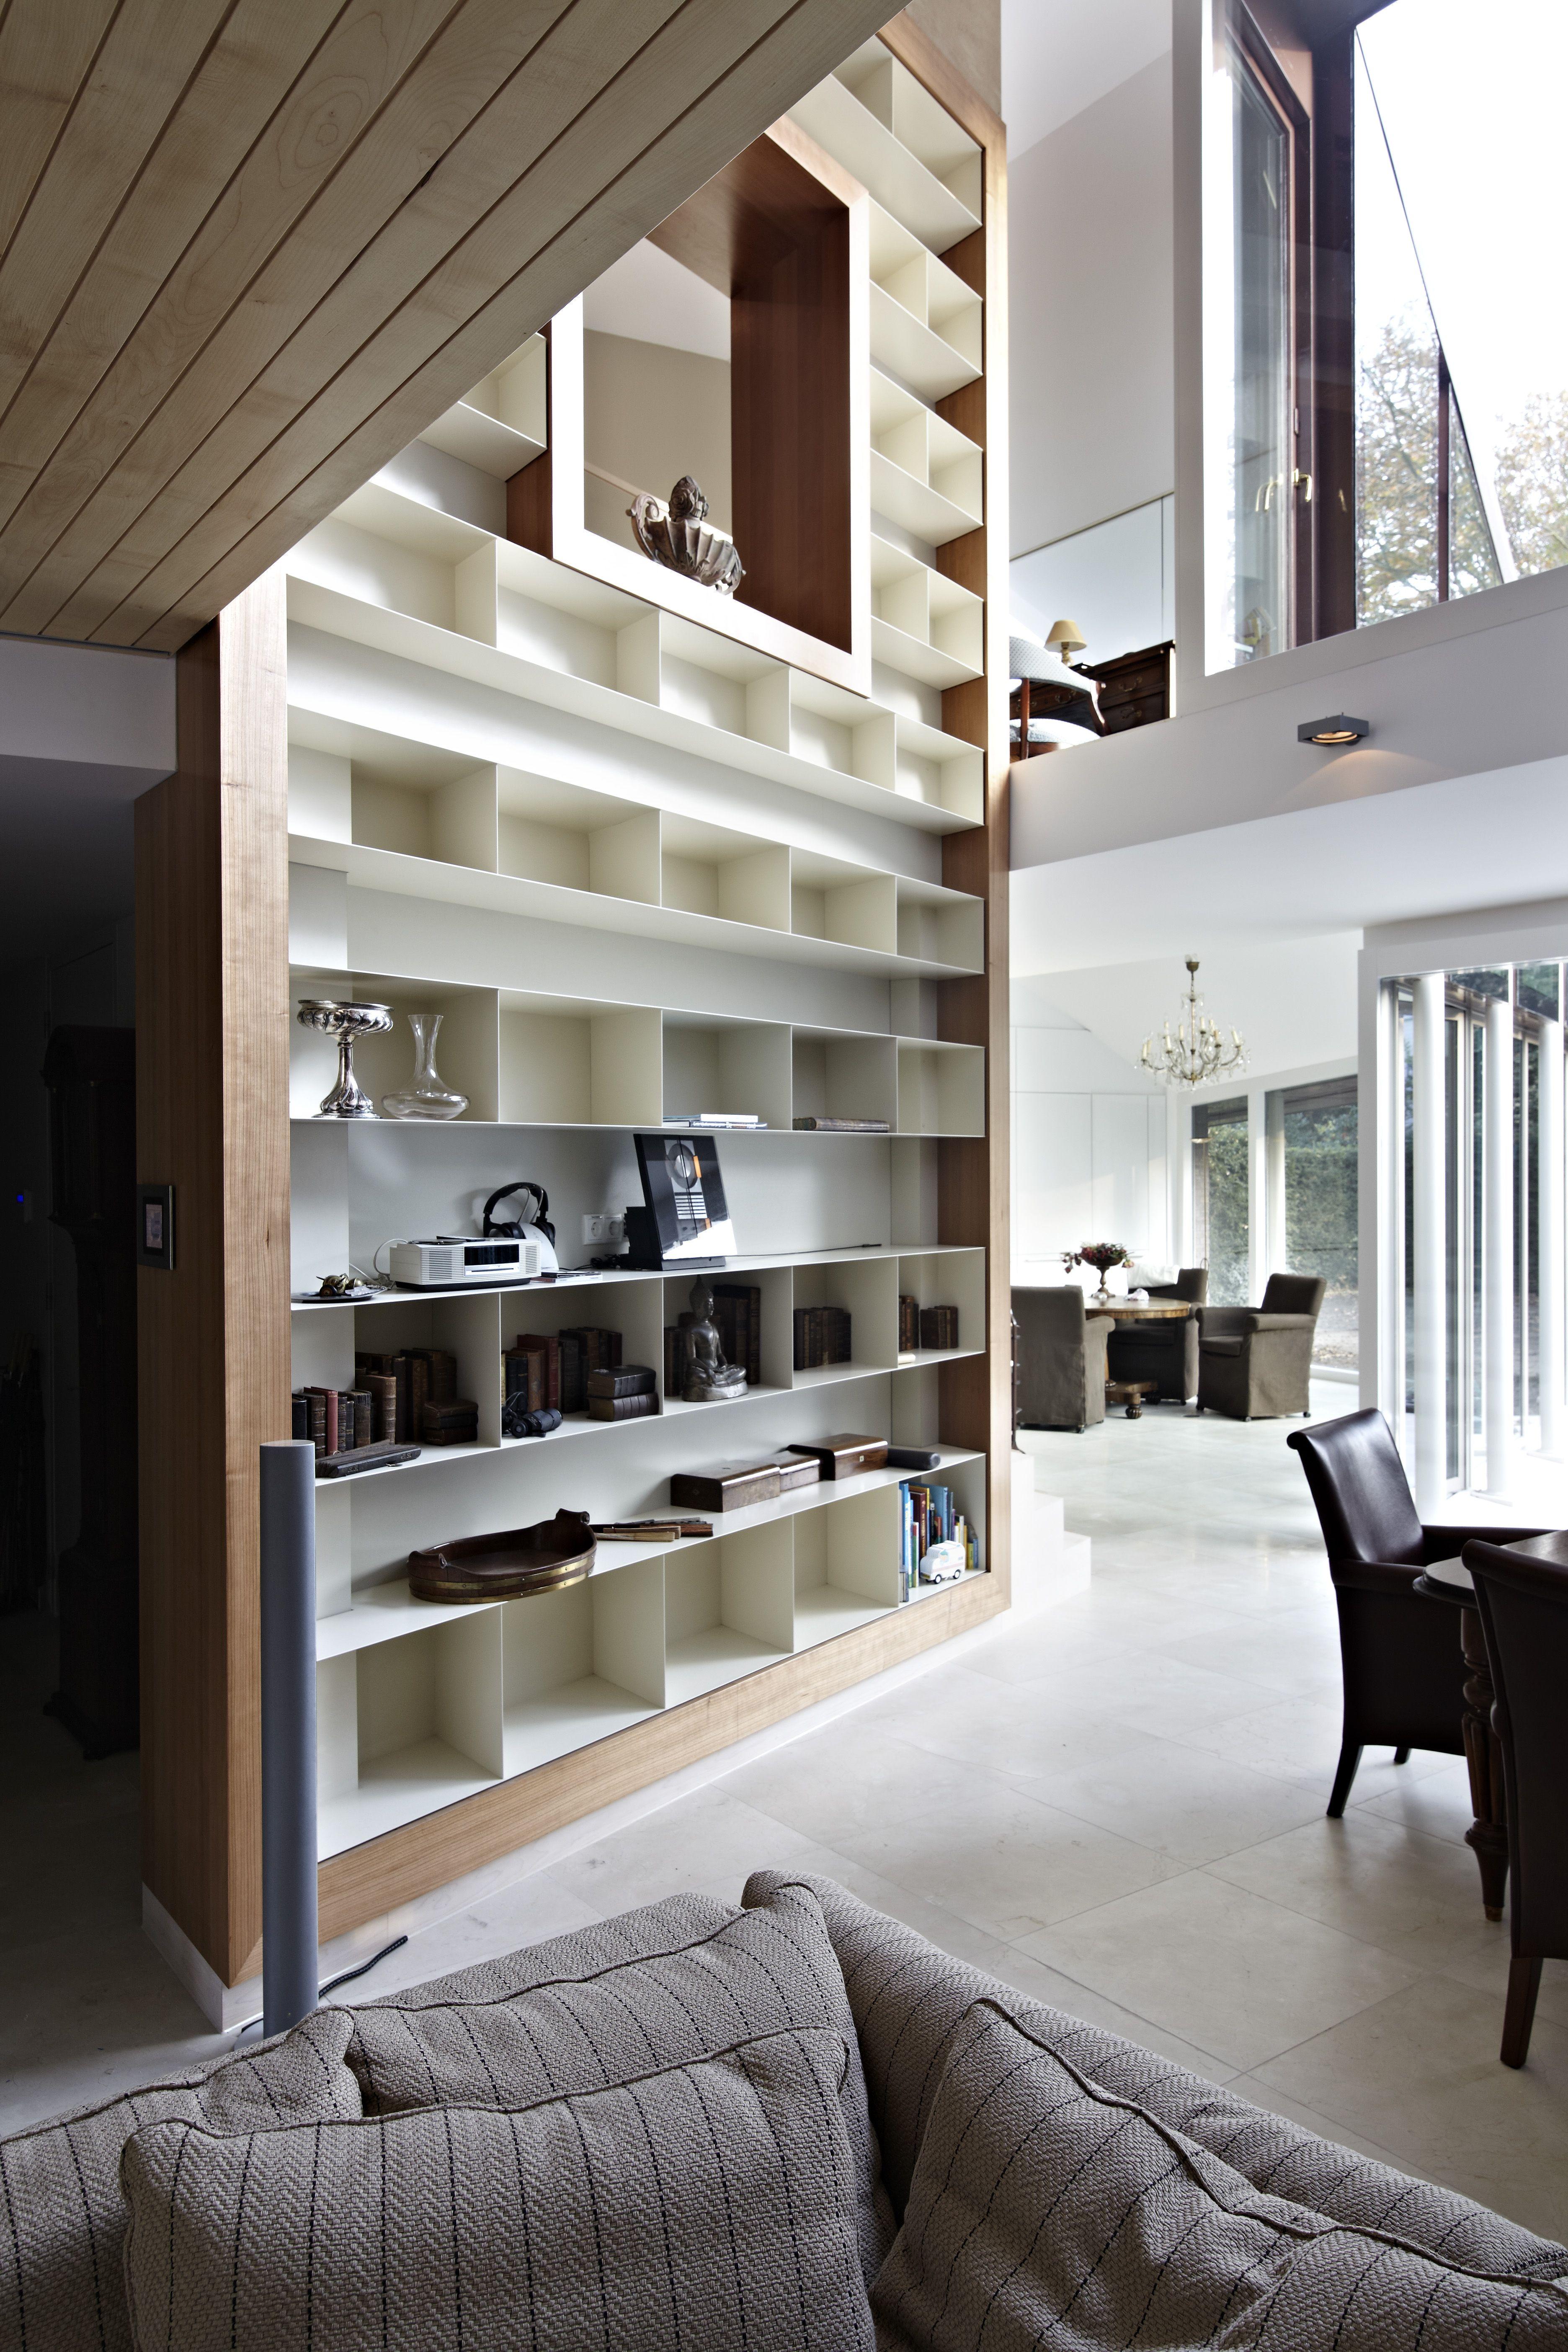 kersen fineer inbouwkast opmaat houtwerk boekenrek boekenkast